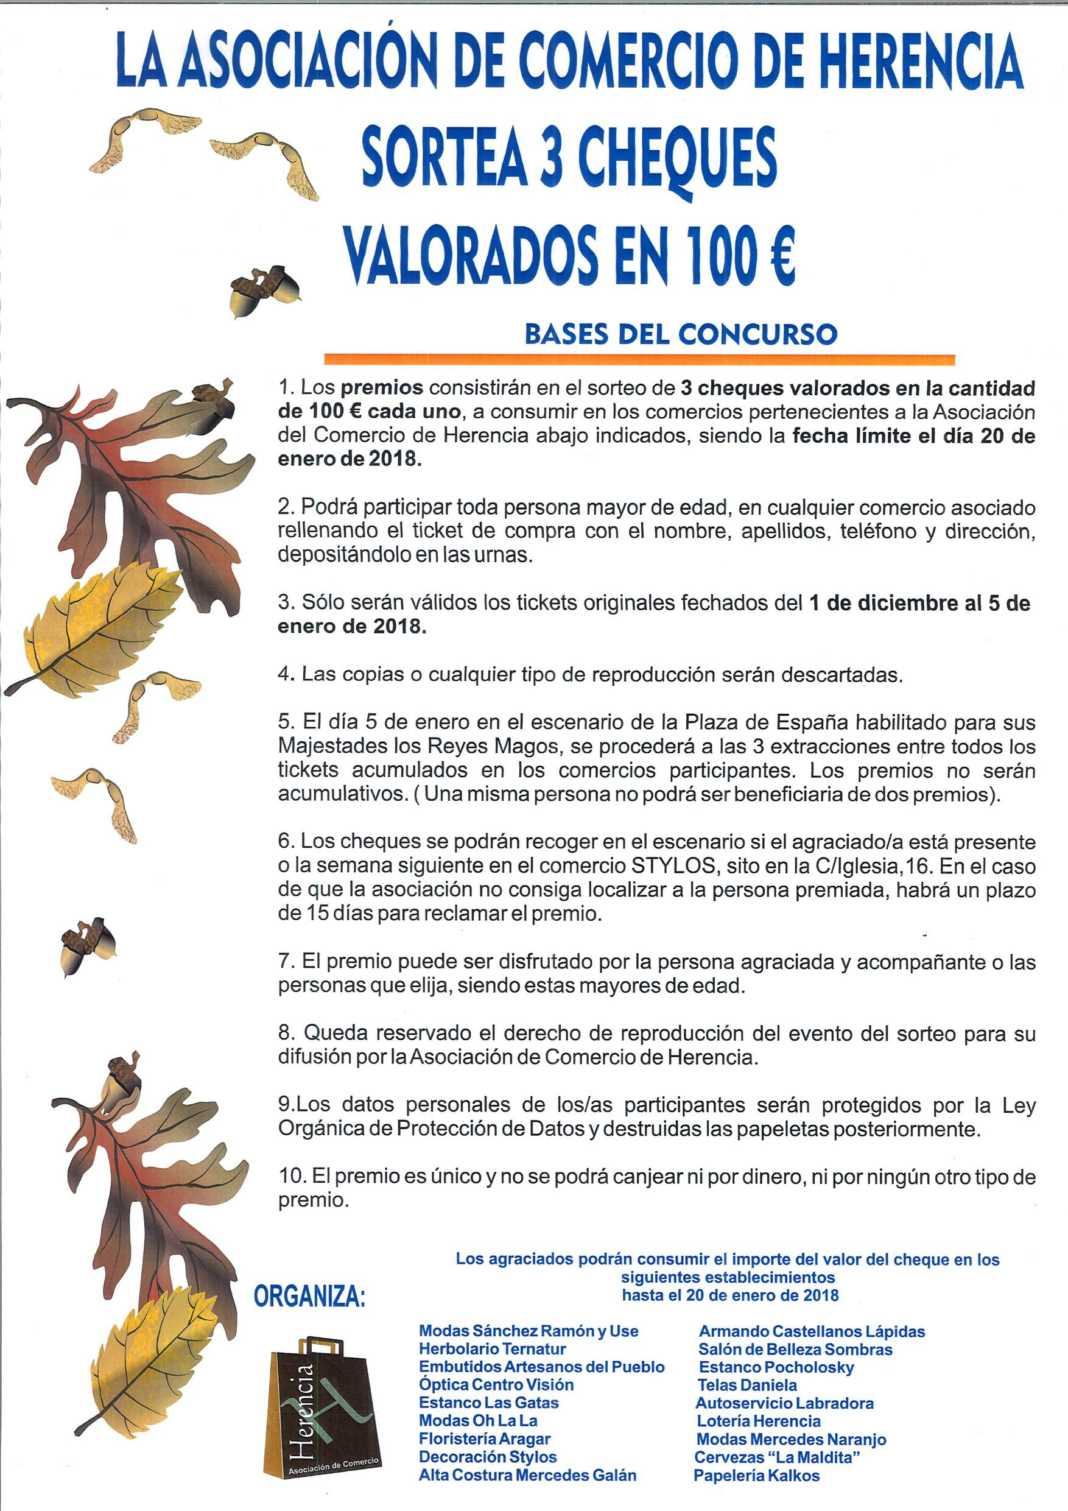 La Asociación de Comercio de Herencia sortea cheques valorados en 100 euros 4